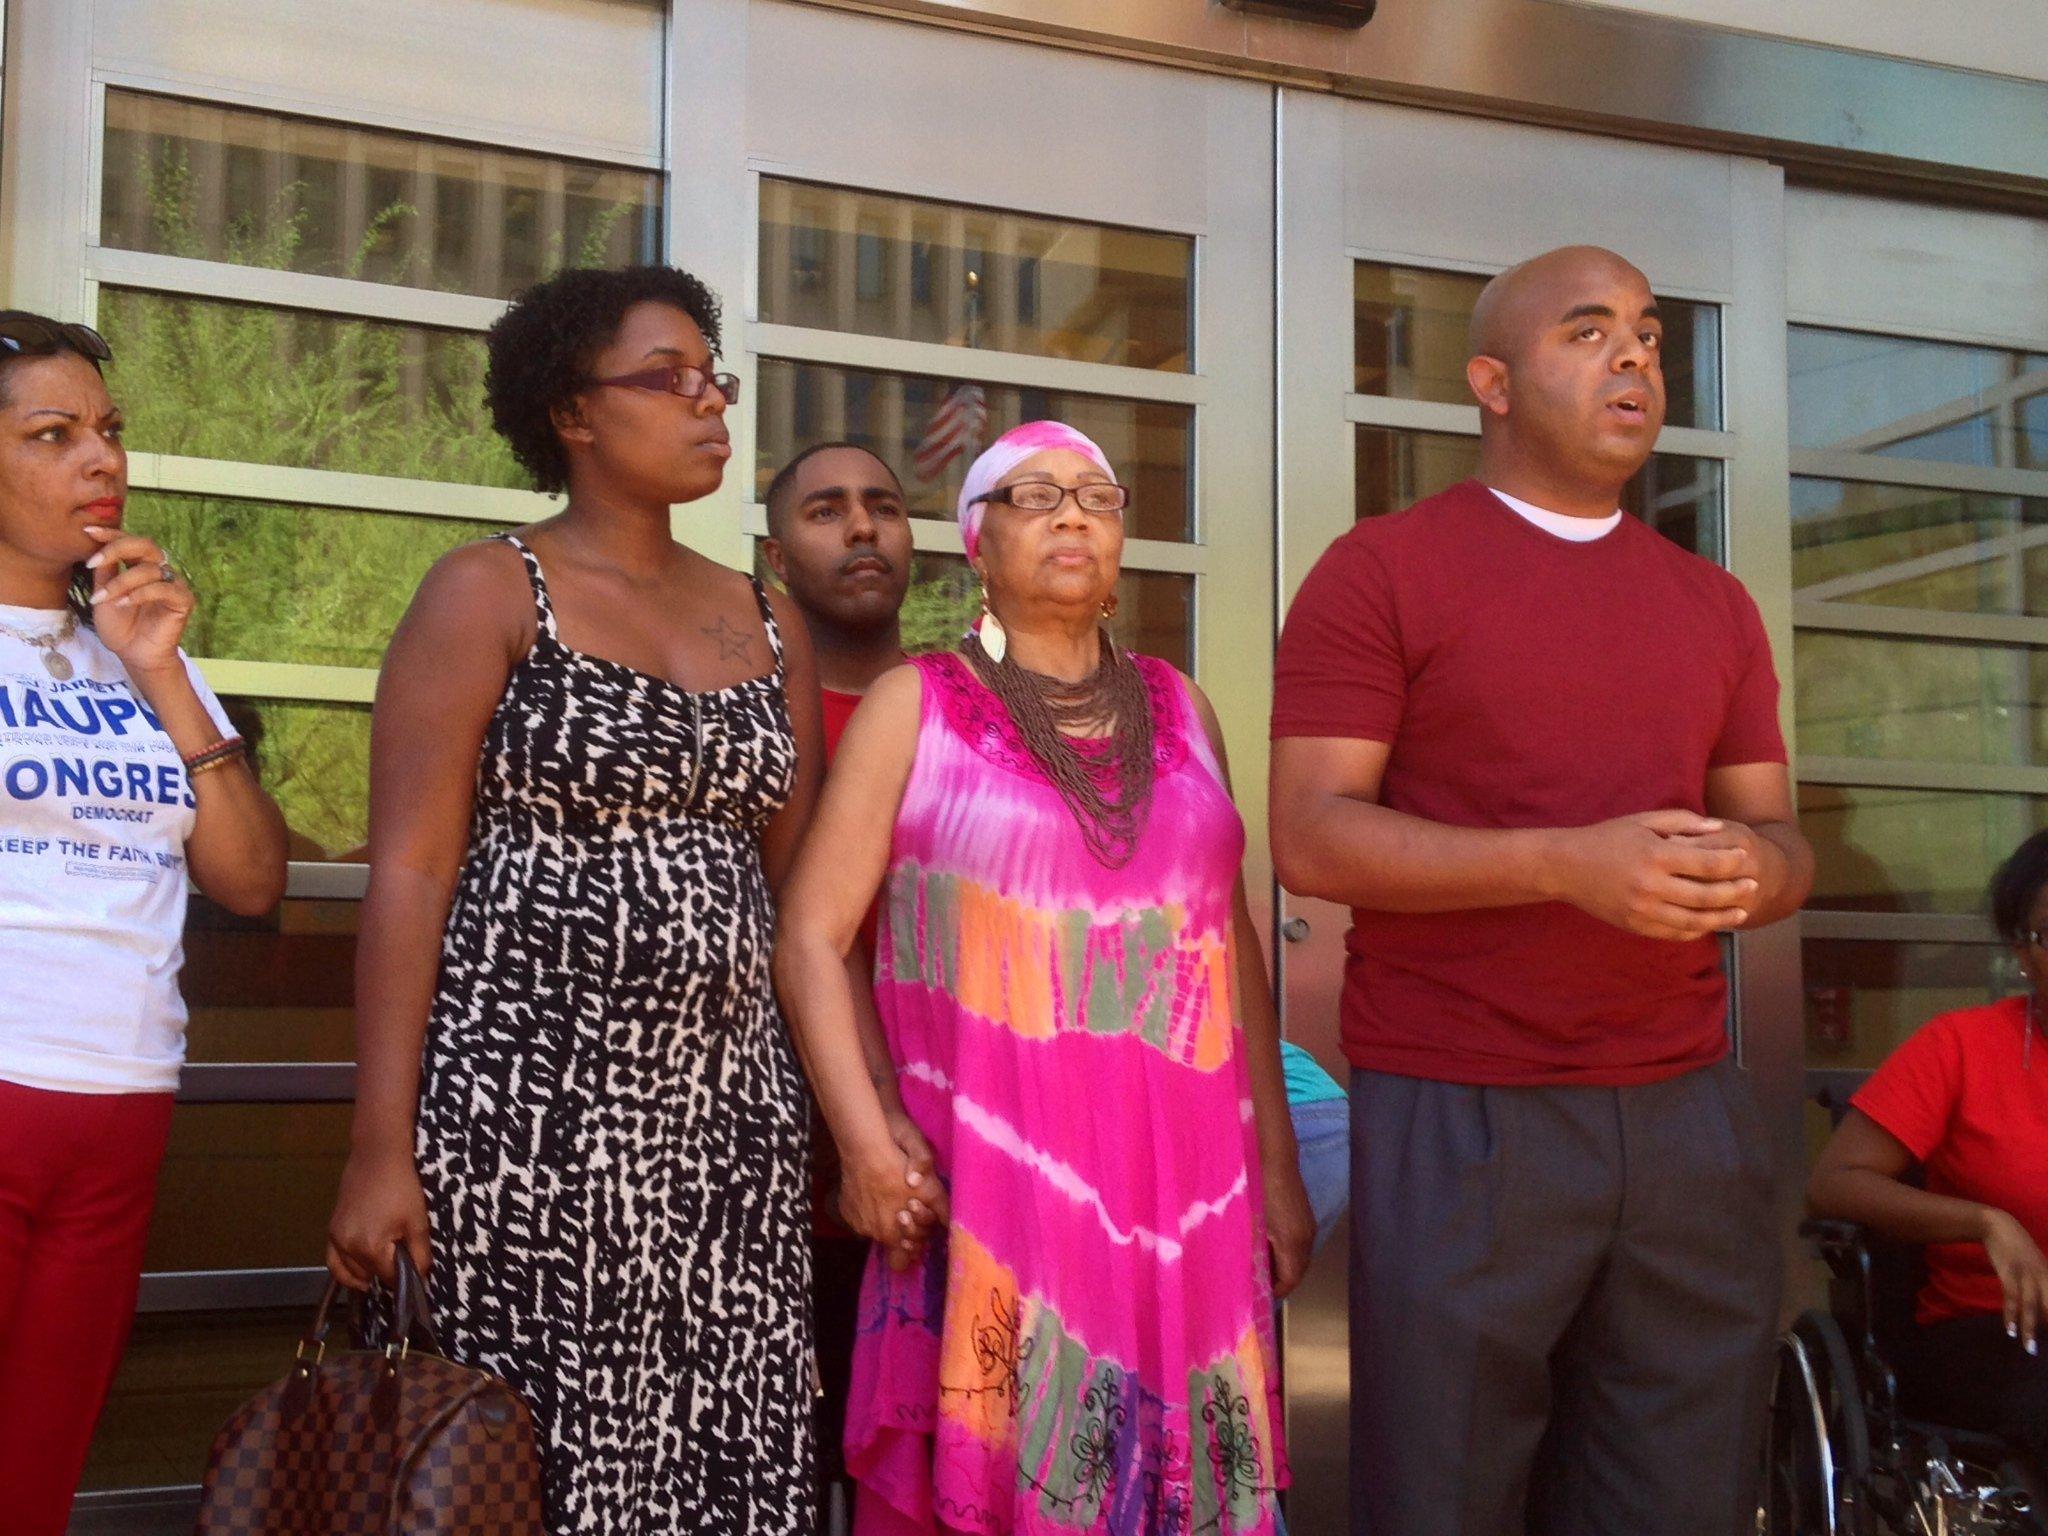 Demonstrators outside Phoenix City Hall. (Source: Christina Batson, cbs5az.com)